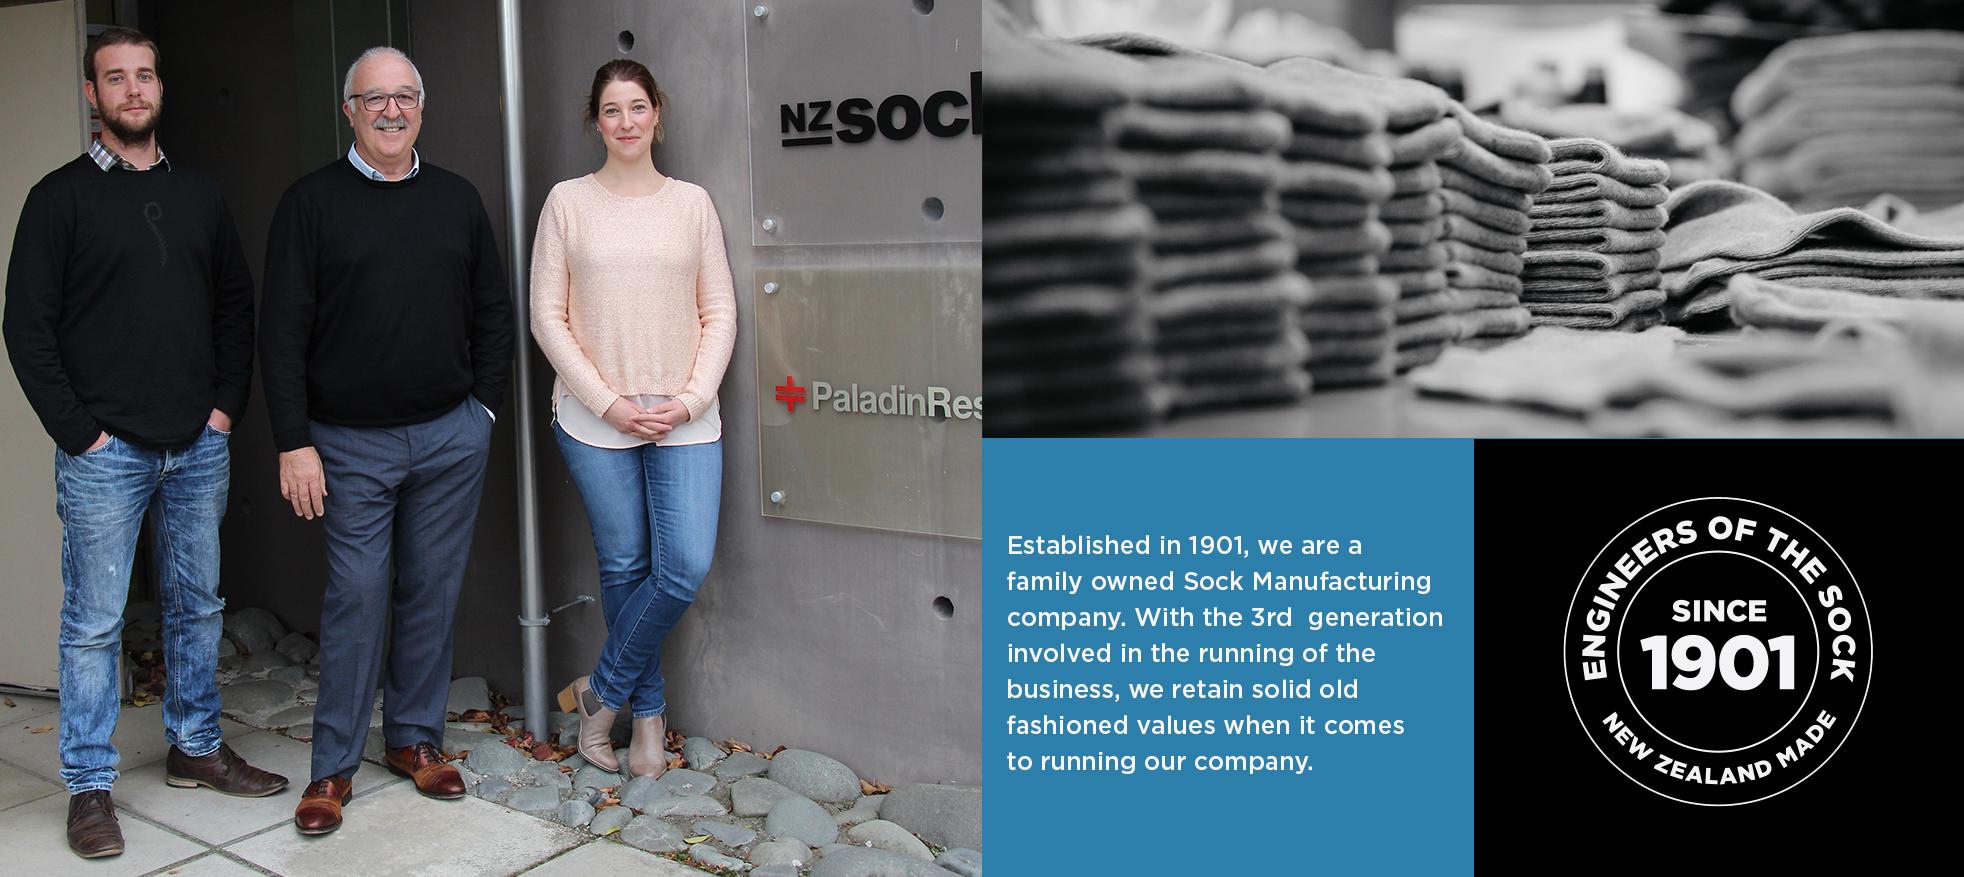 NZ Sock Co - The New Zealand Sock Company